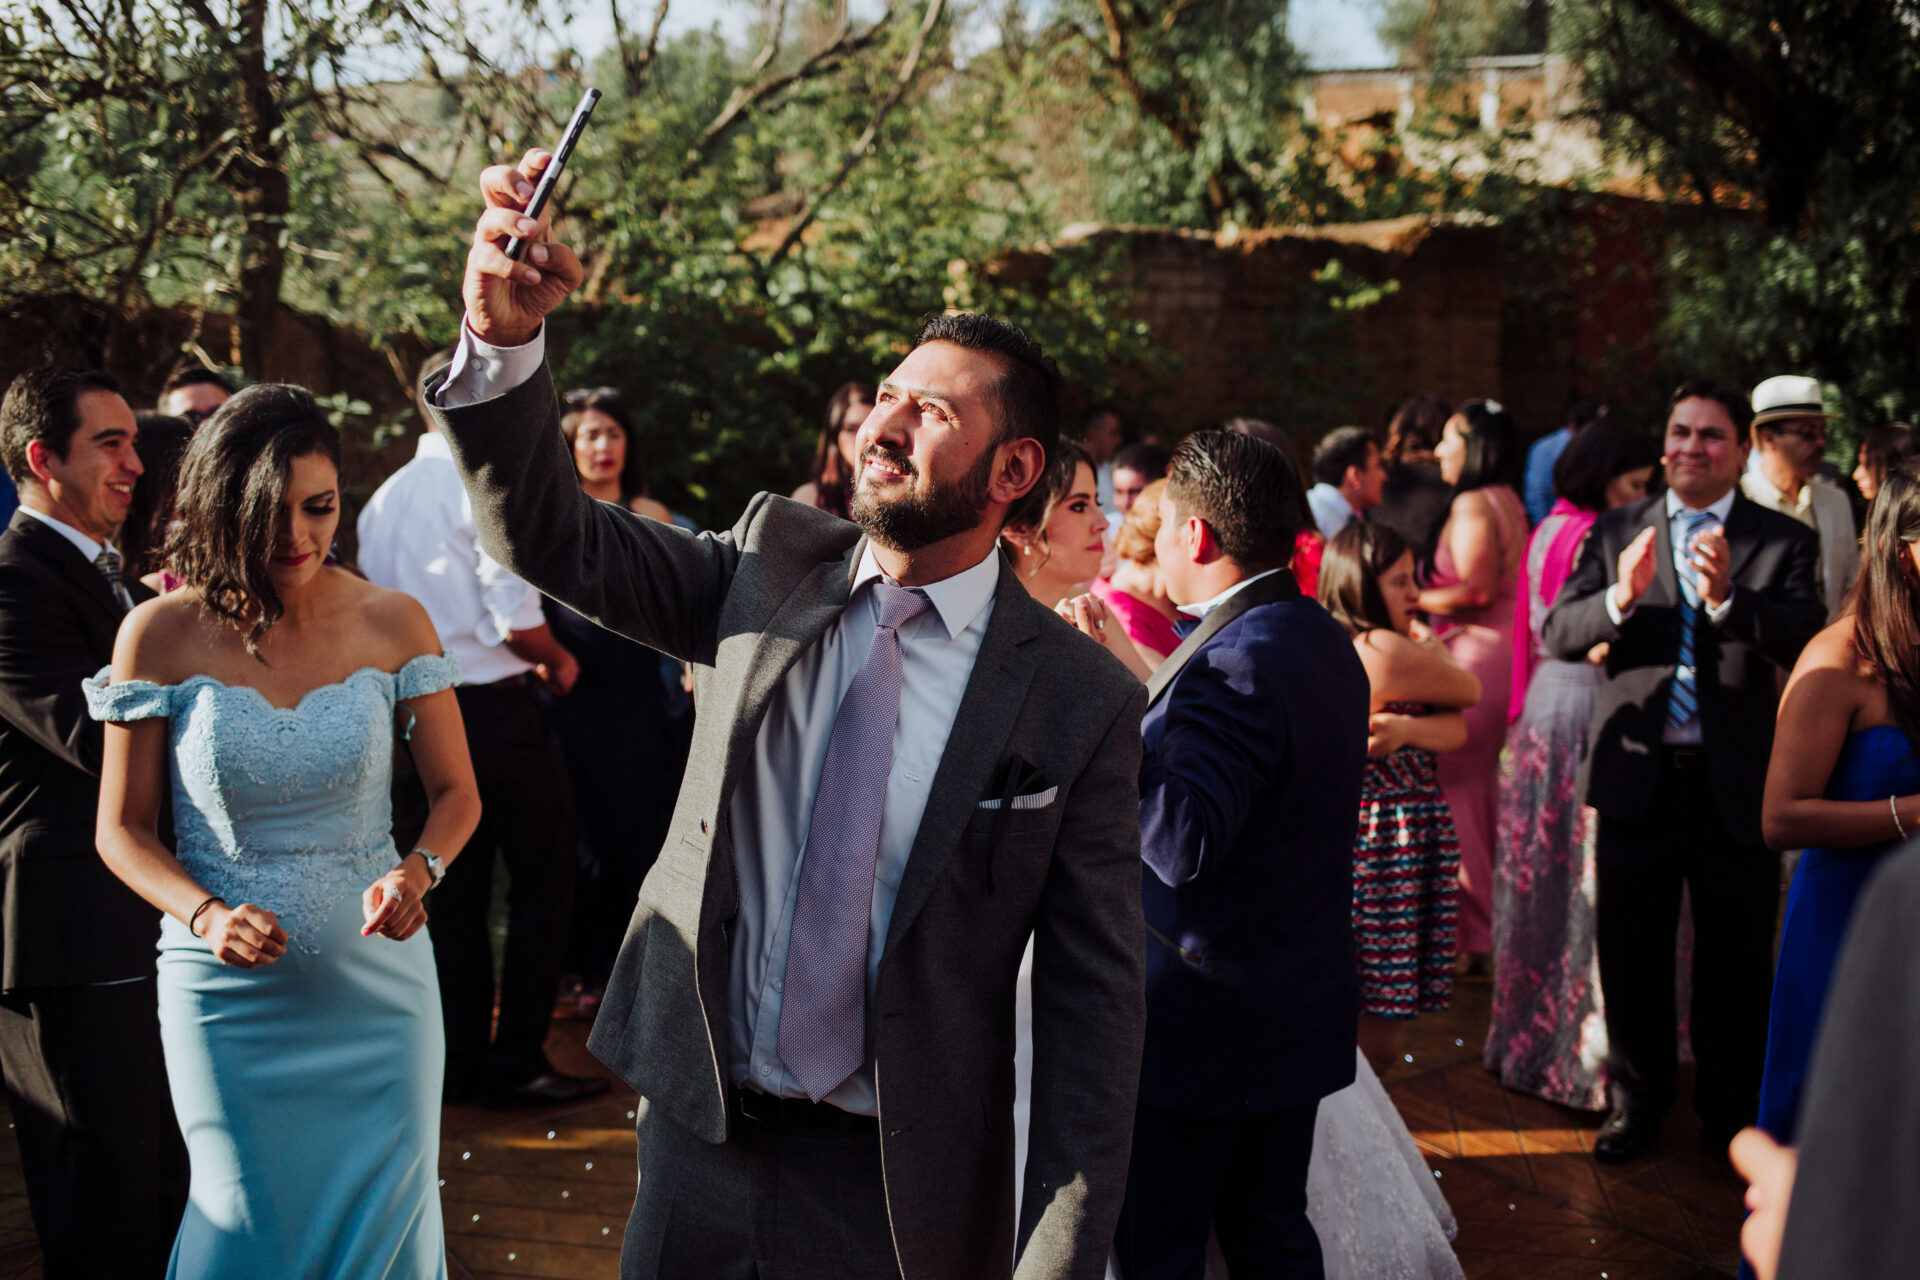 javier_noriega_fotografo_bodas_exhacienda_las_mercedes_zacatecas_wedding_photographer16a